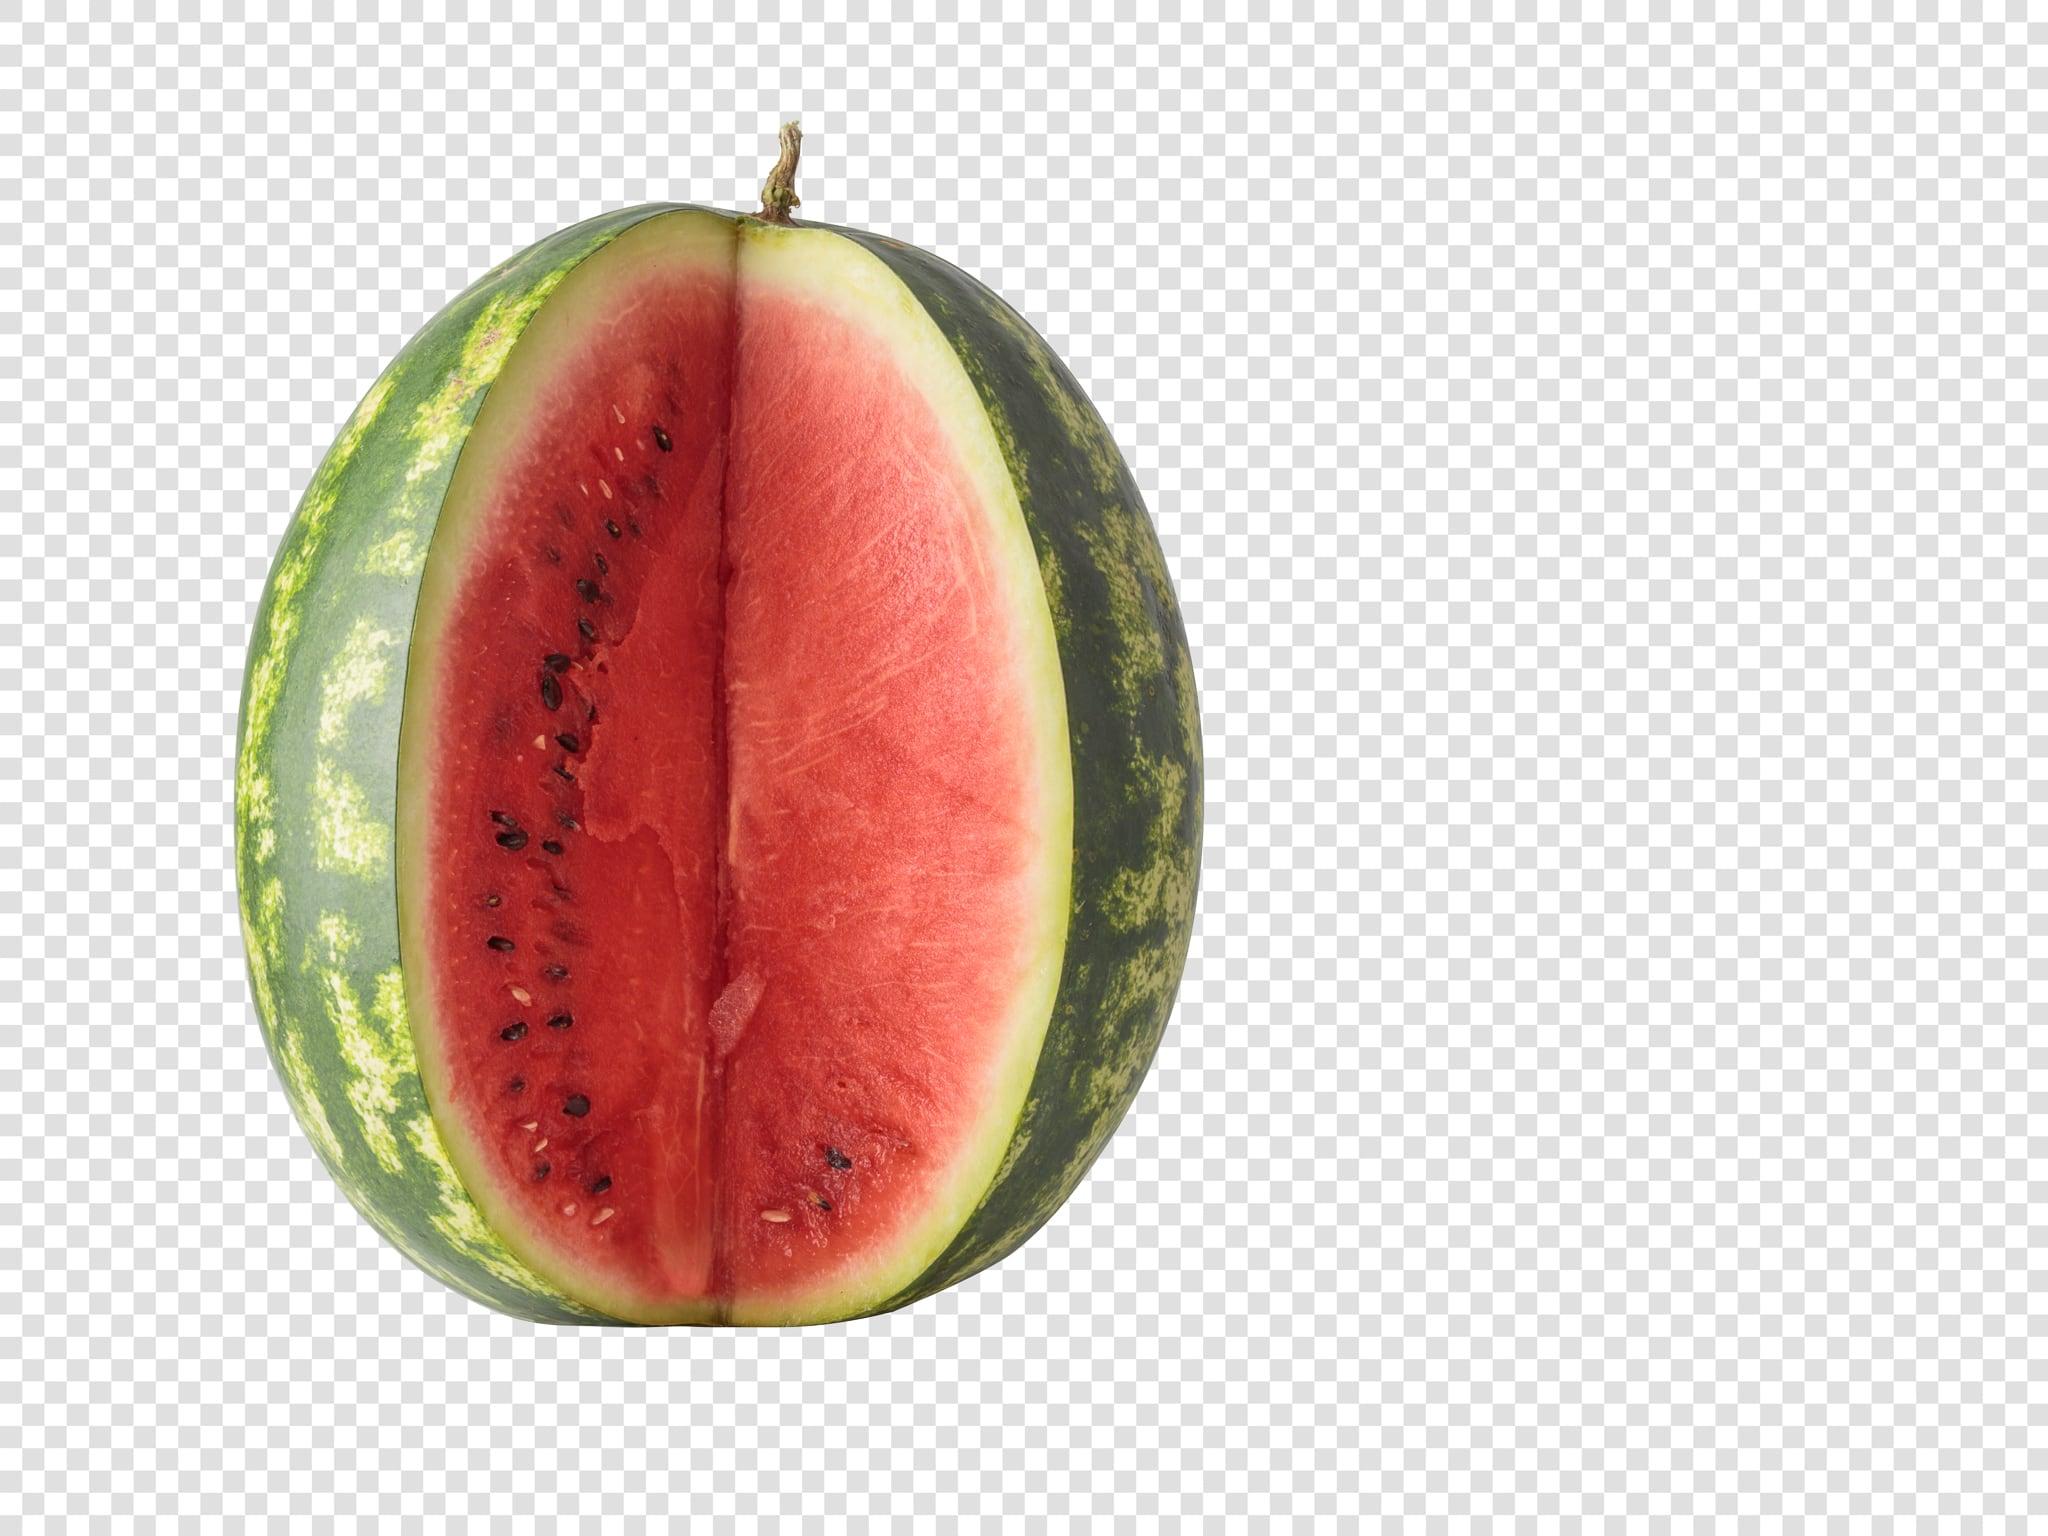 Watermelon PSD layered image